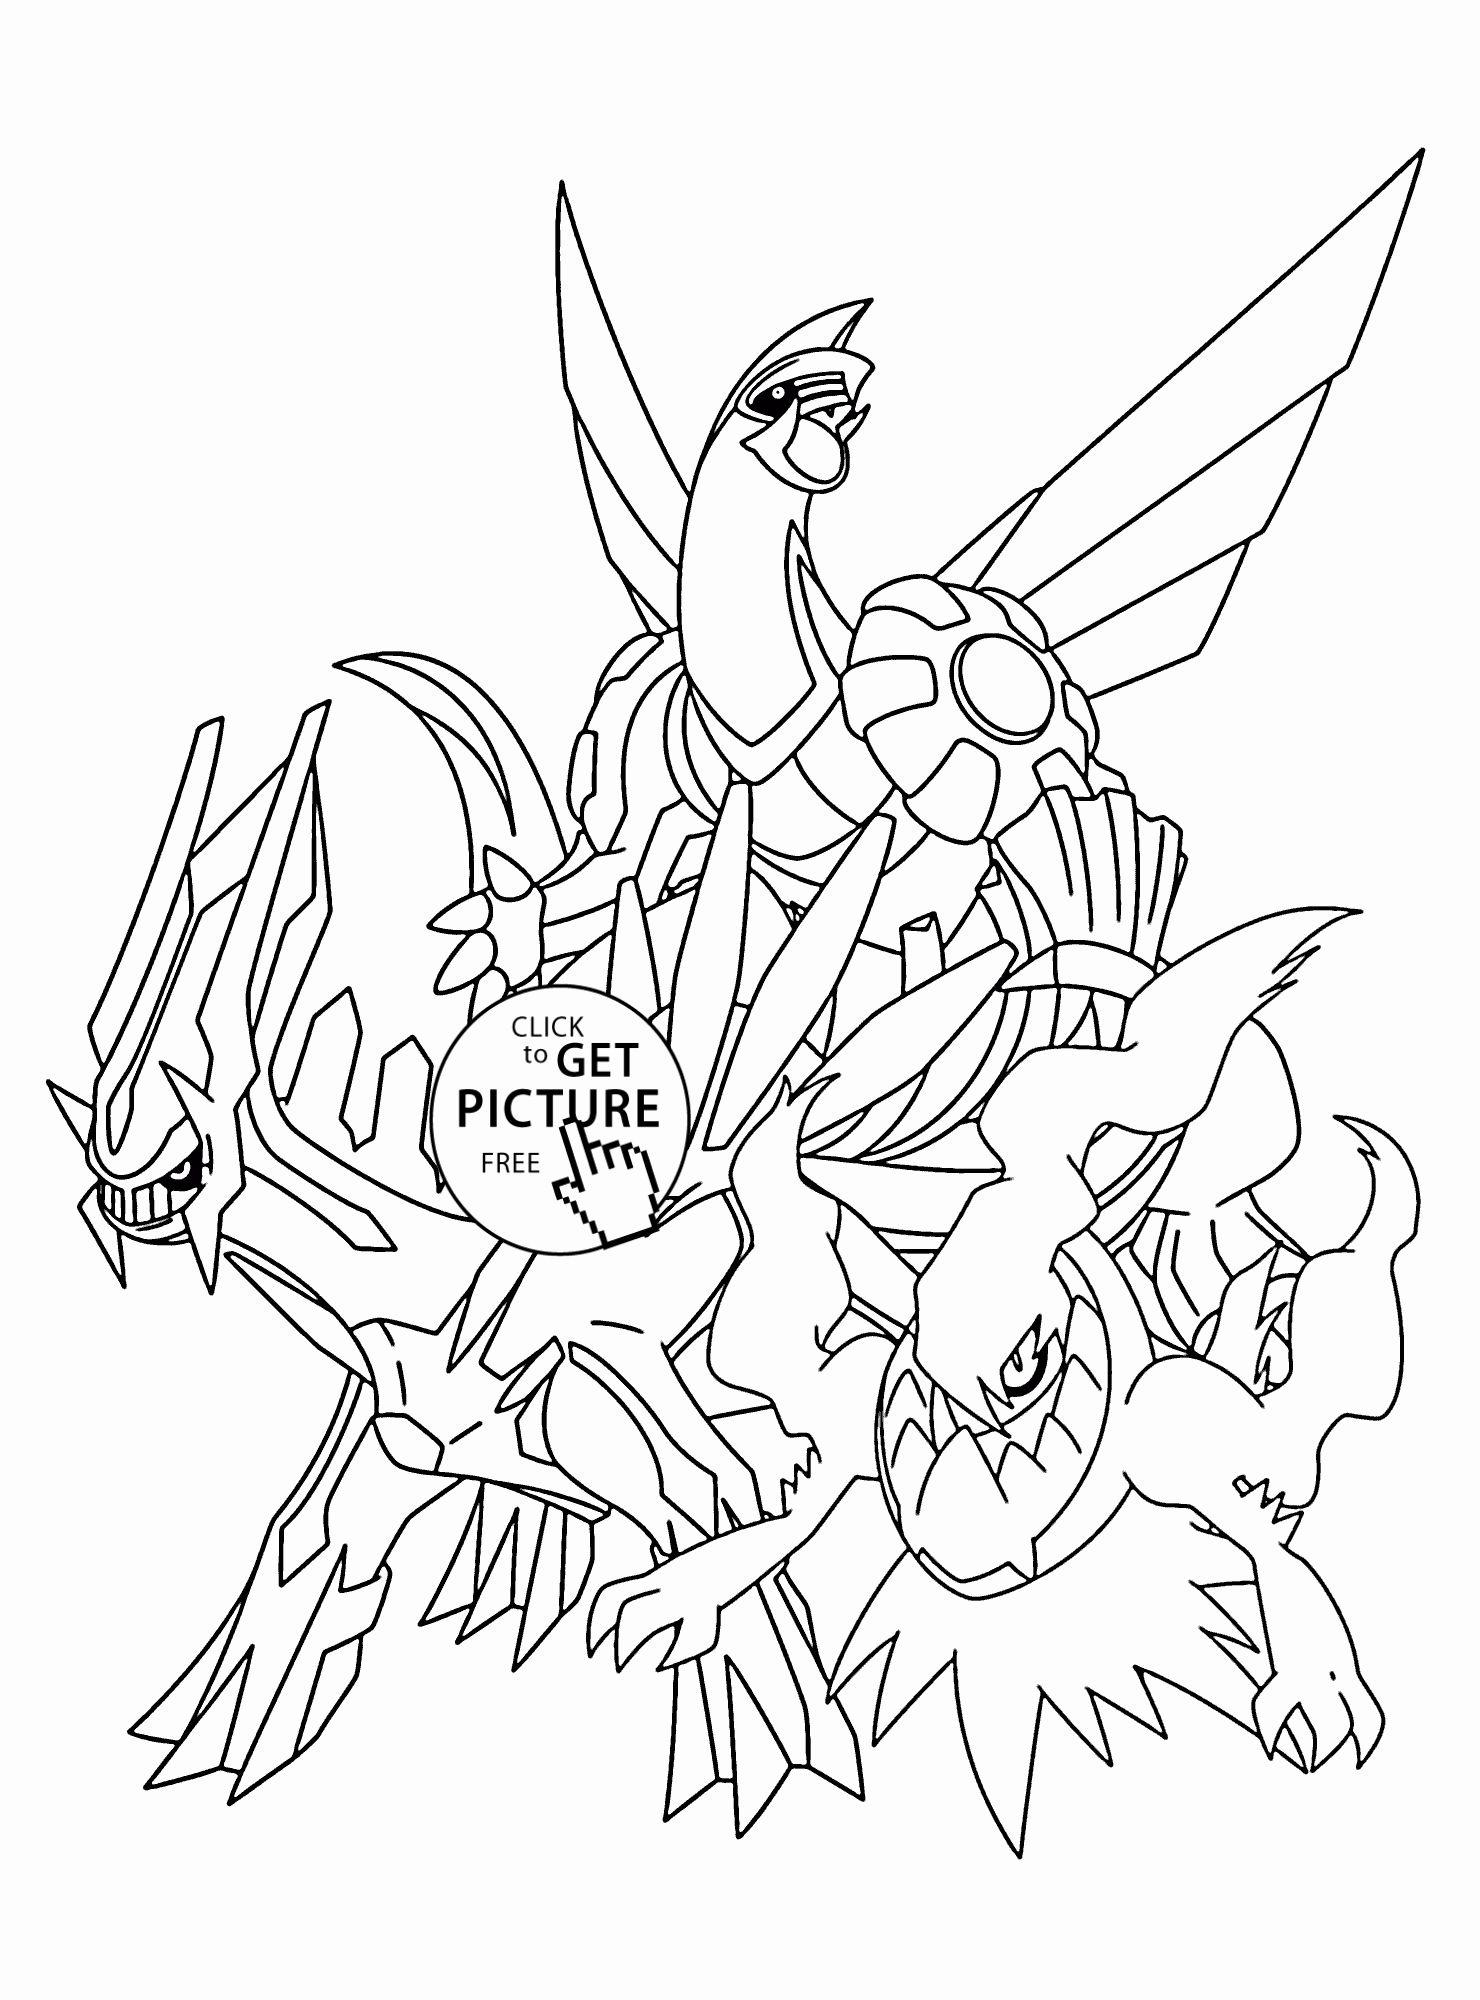 Legendary Pokemon Coloring Page Luxury Legendary Pokemon Coloring Pages For Kids Pokemon